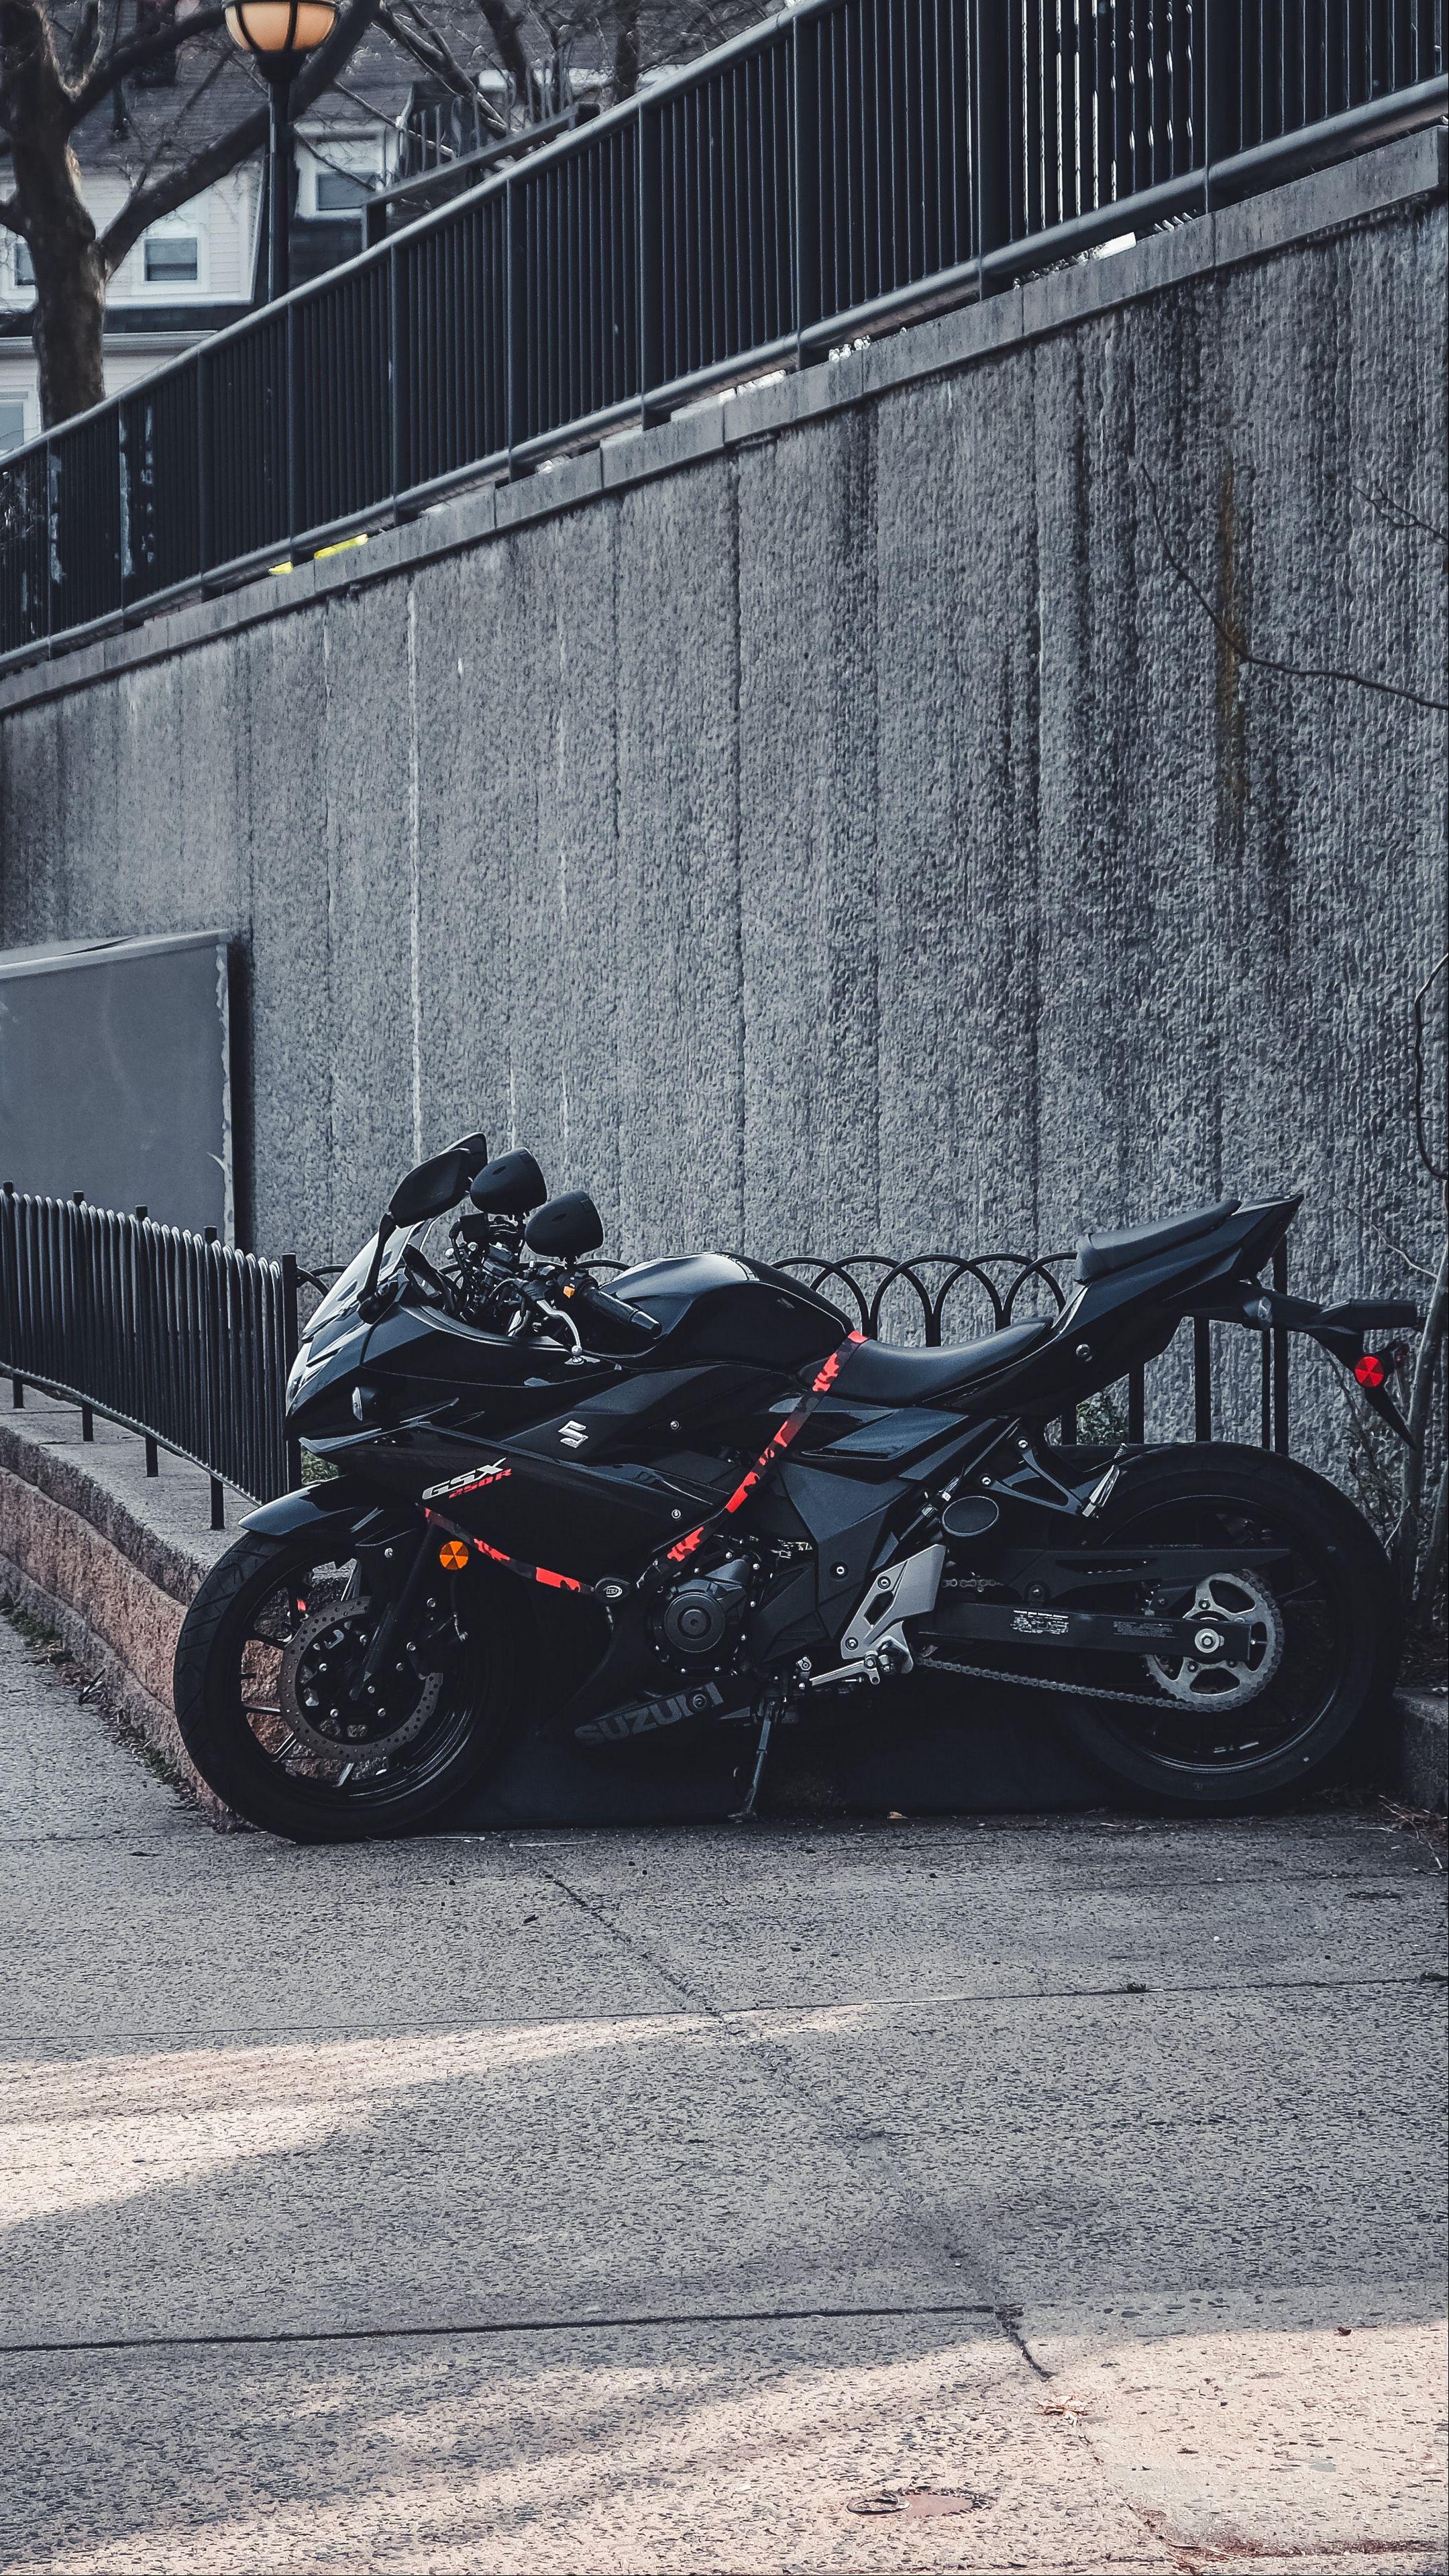 2160x3840 Wallpaper suzuki, motorcycle, bike, black, parking